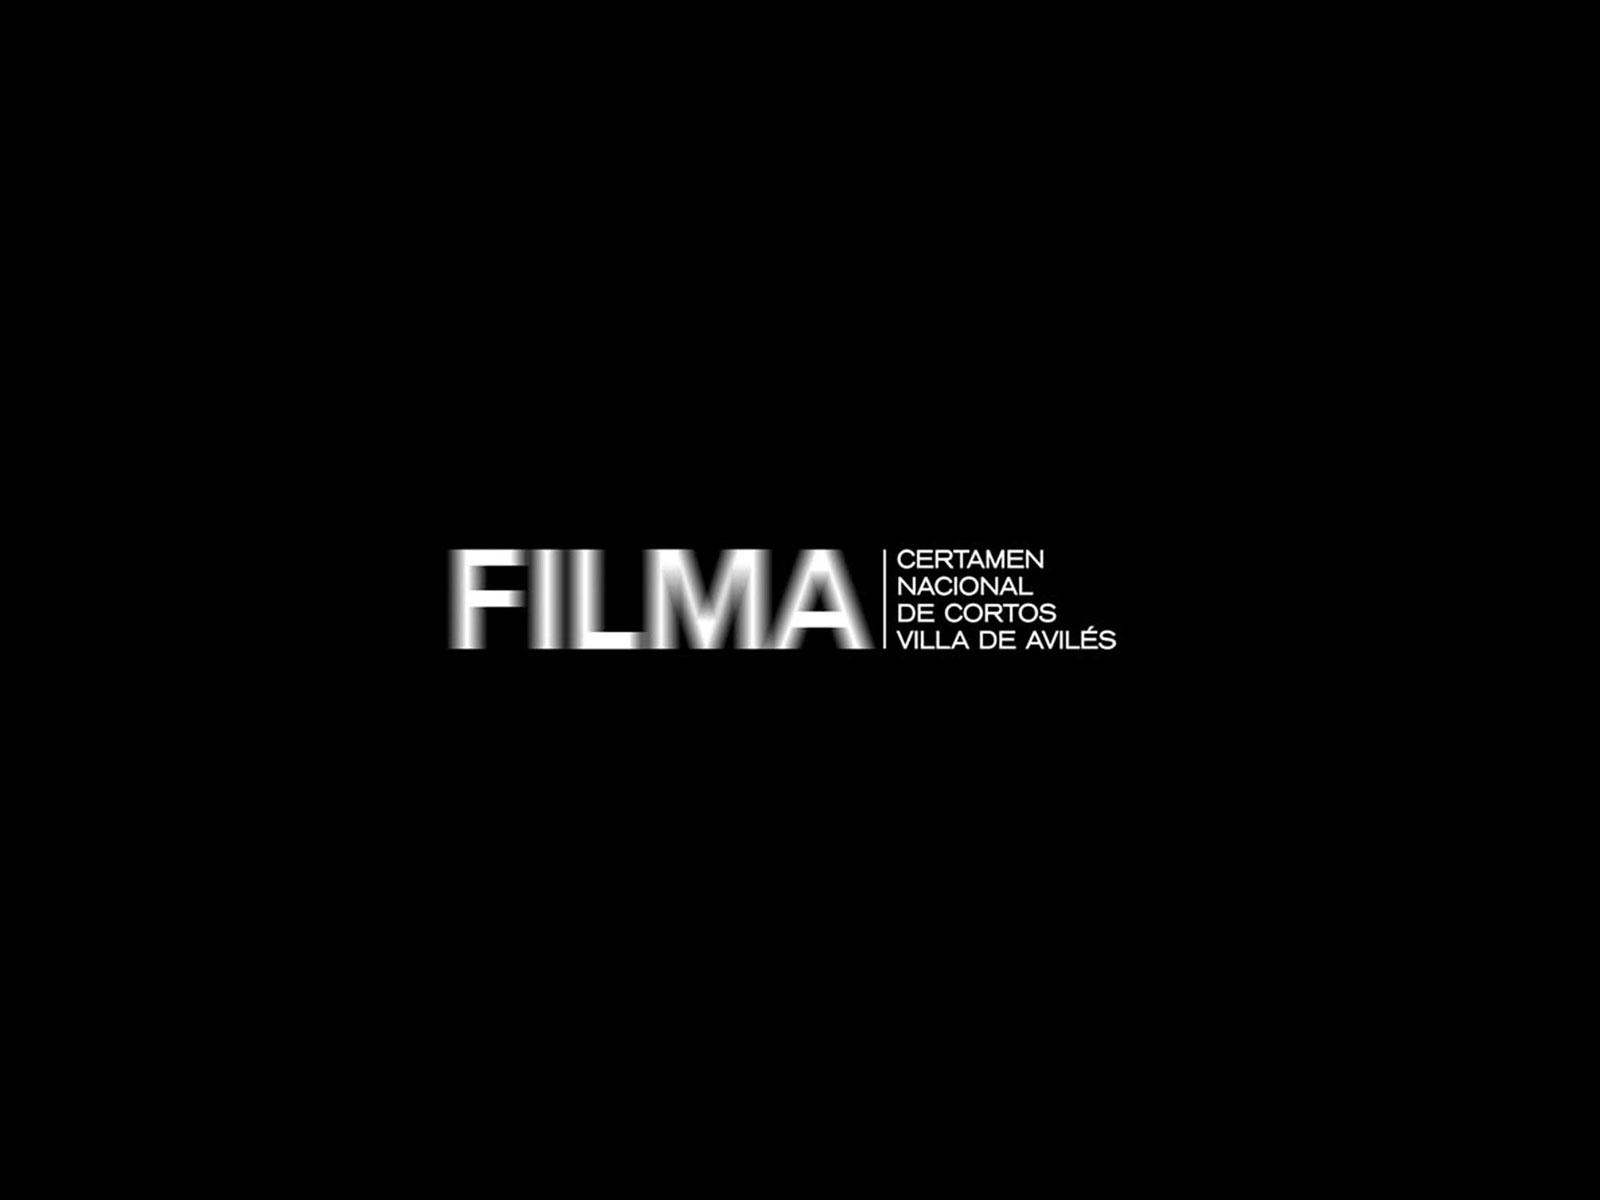 jloisbocos_logos_filma